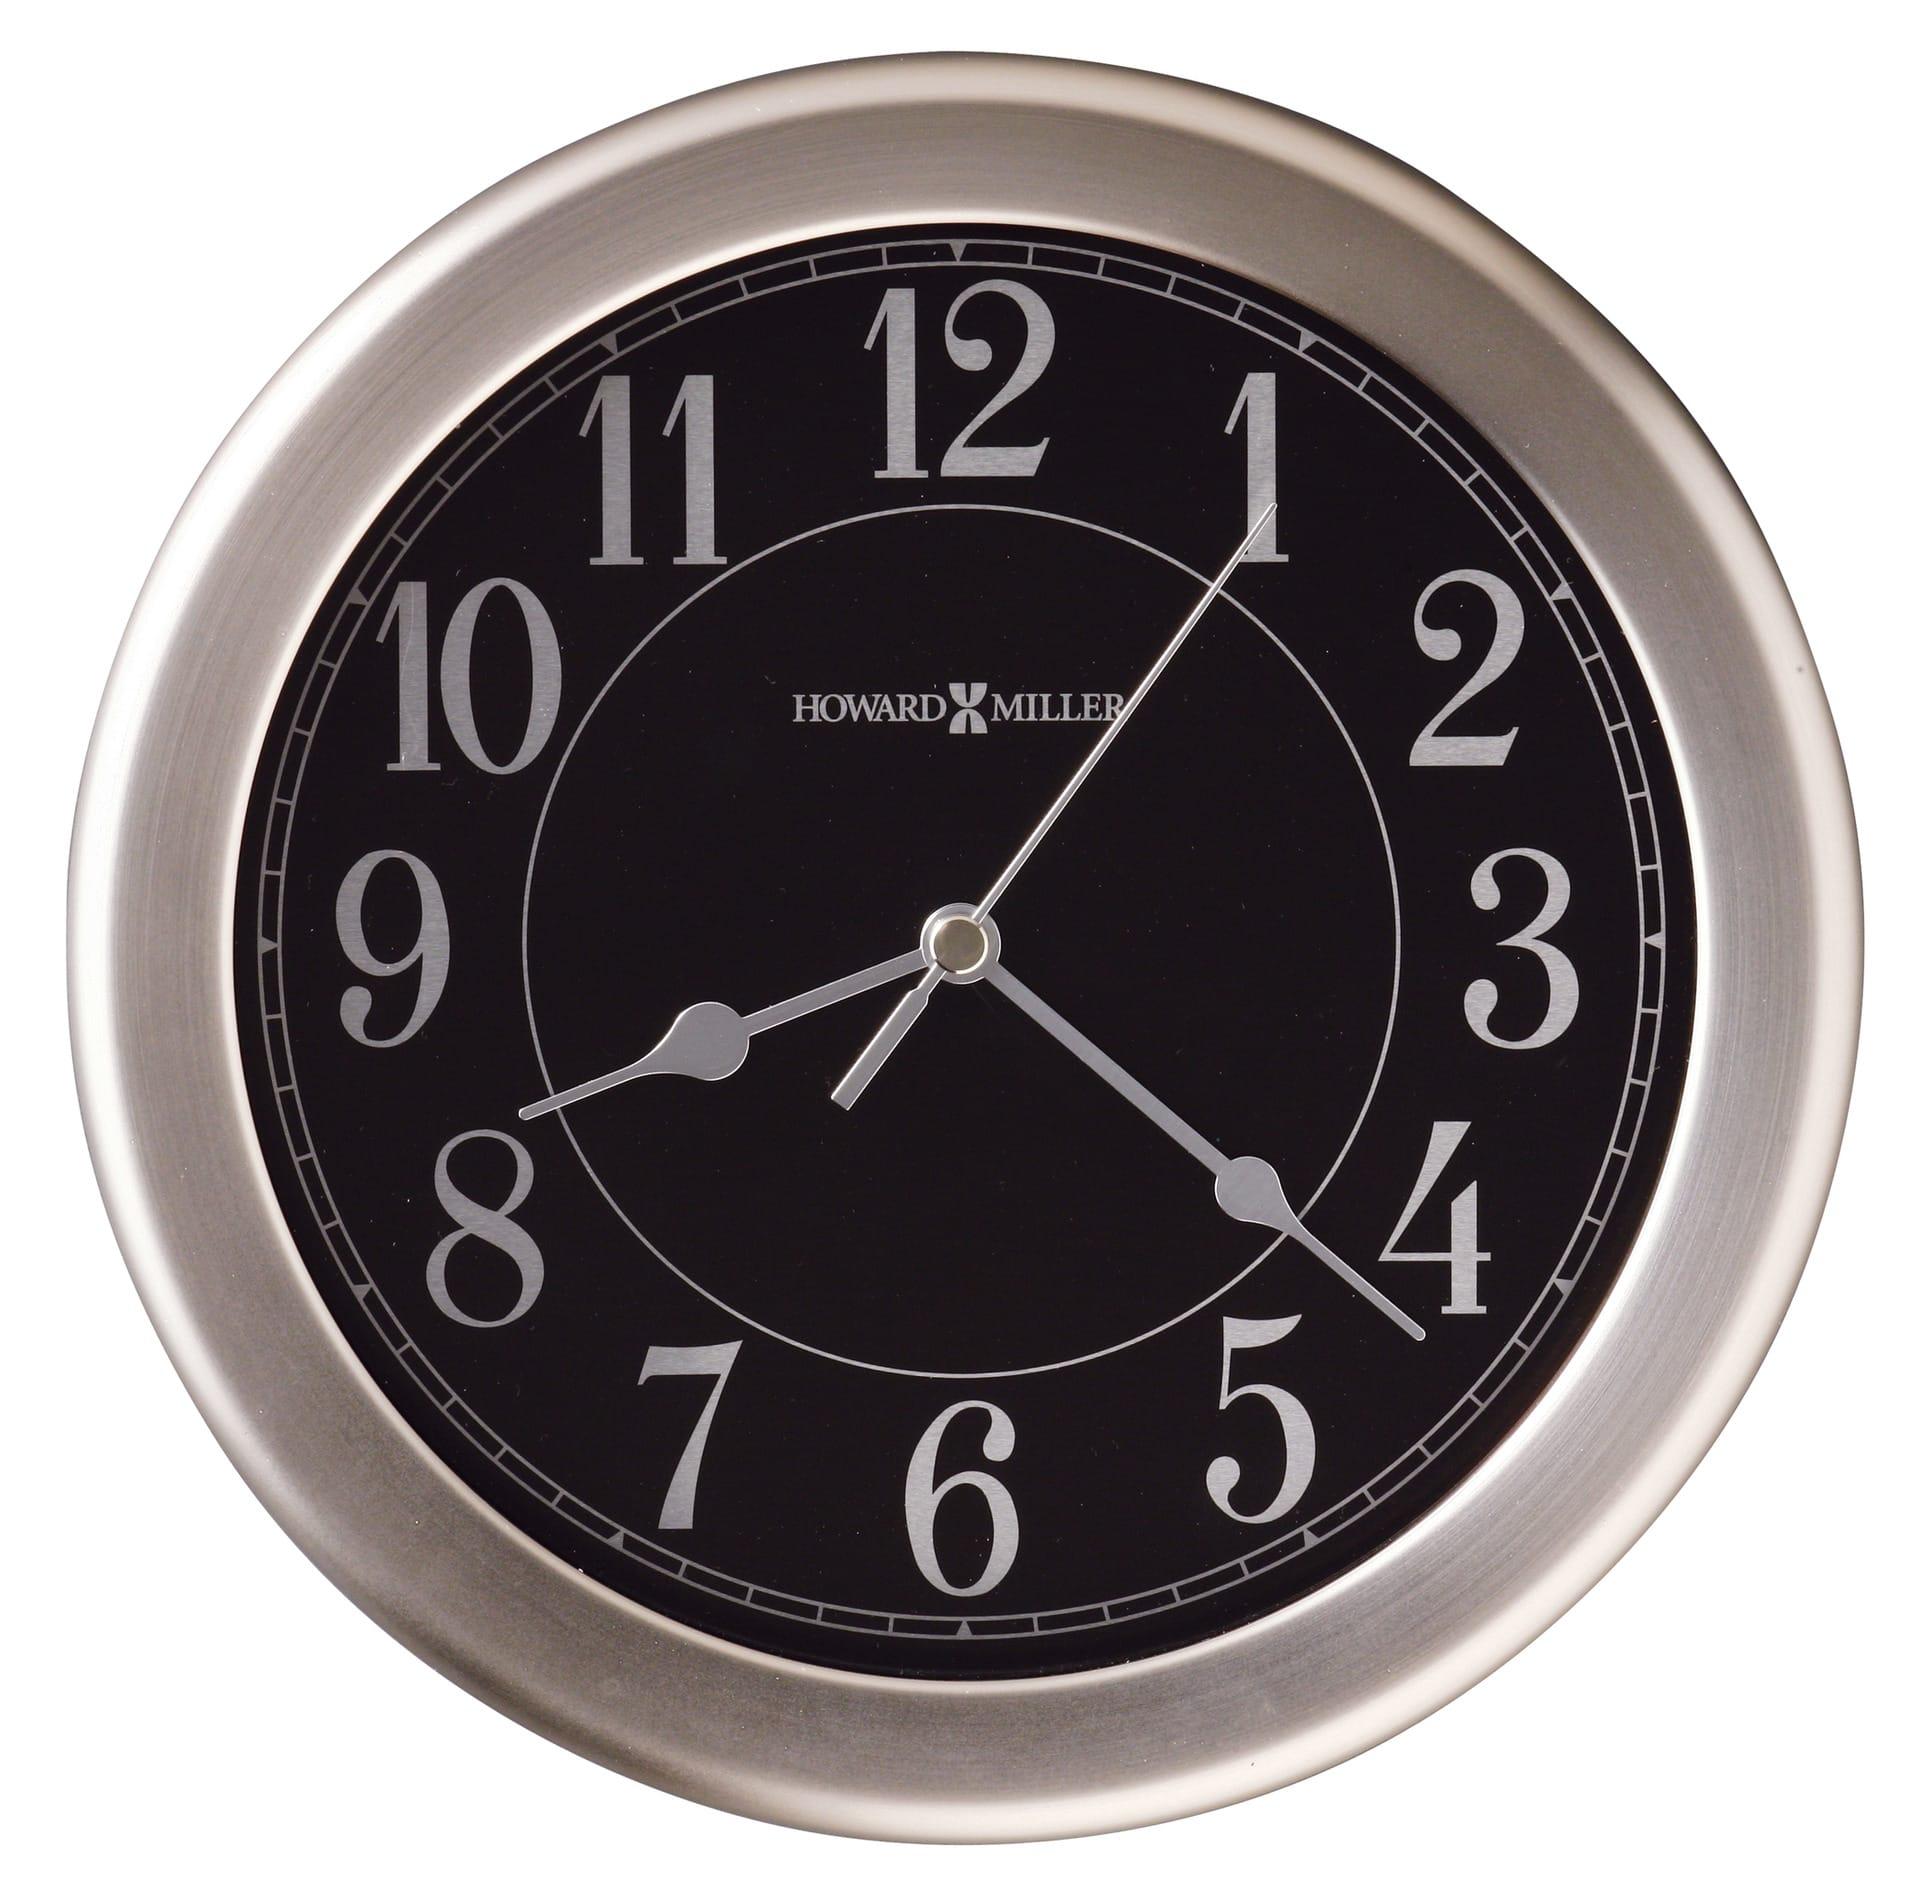 625 530 Libra Wall Clock By Howard Miller